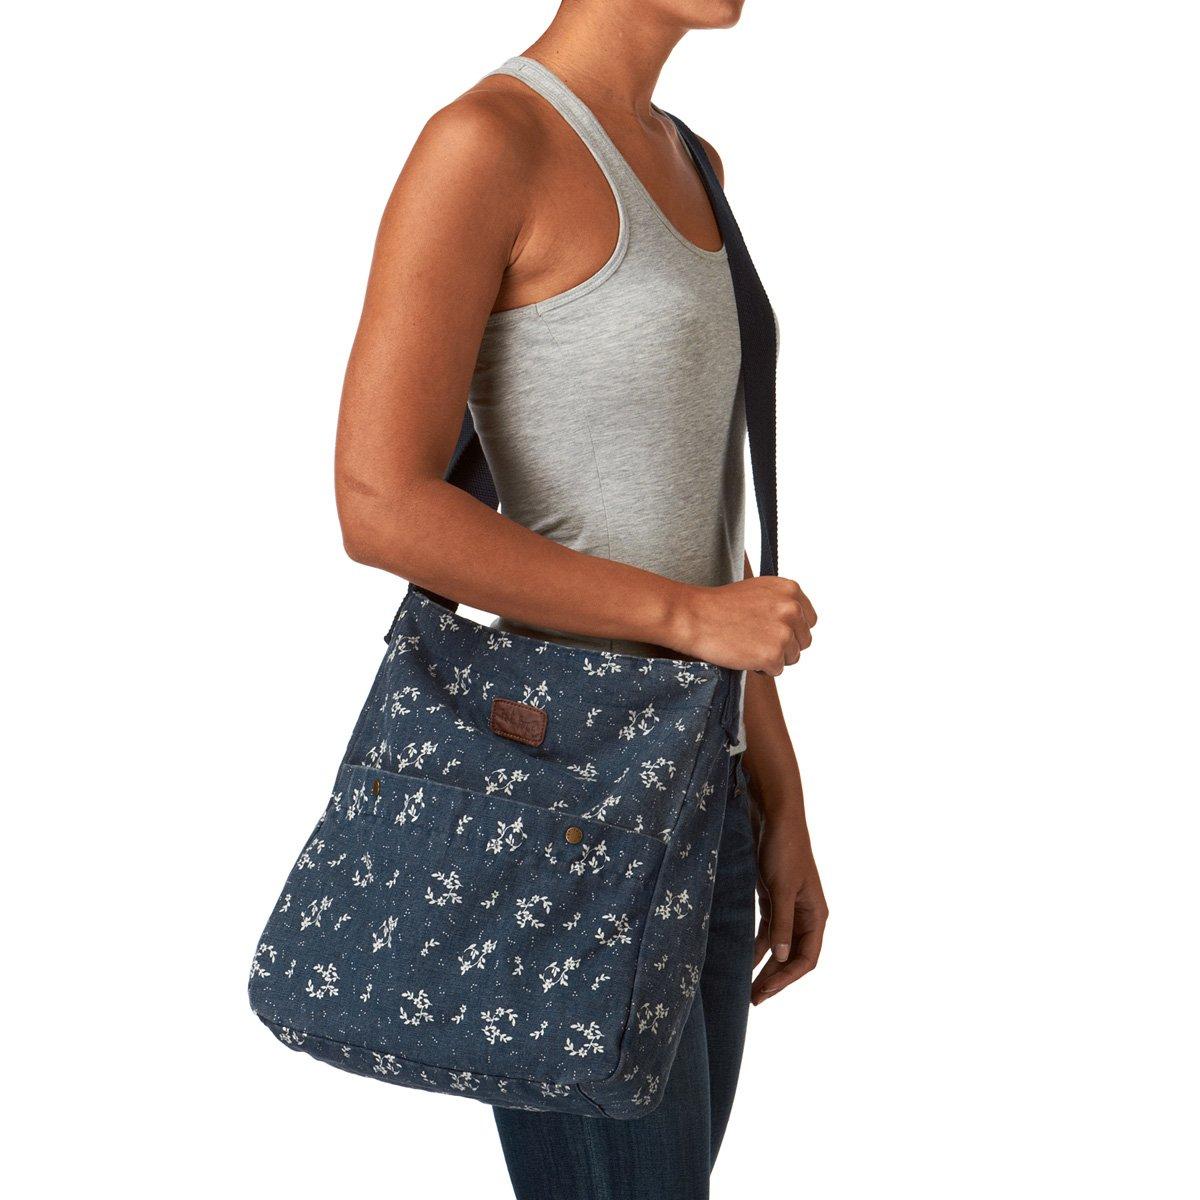 83ba2a10b15 Fat Face Canvas Cross Body Bag - Navy: Amazon.co.uk: Sports & Outdoors